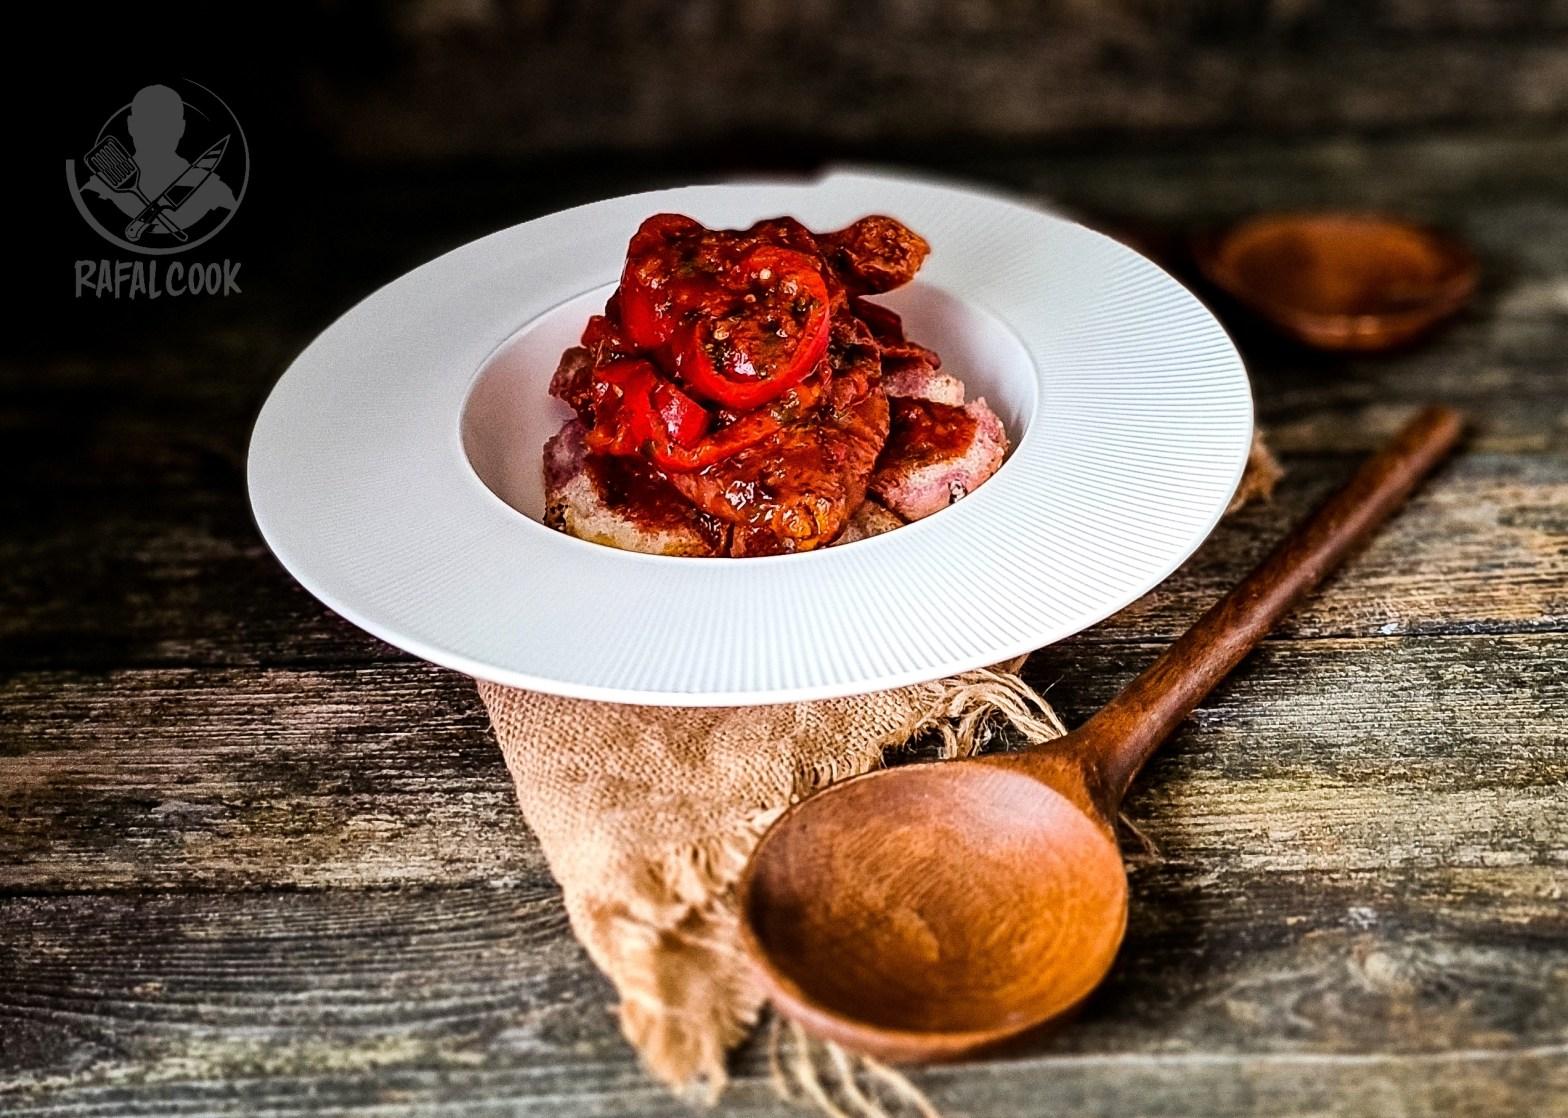 Pollo con Peperoni z kuchni rzymskiej